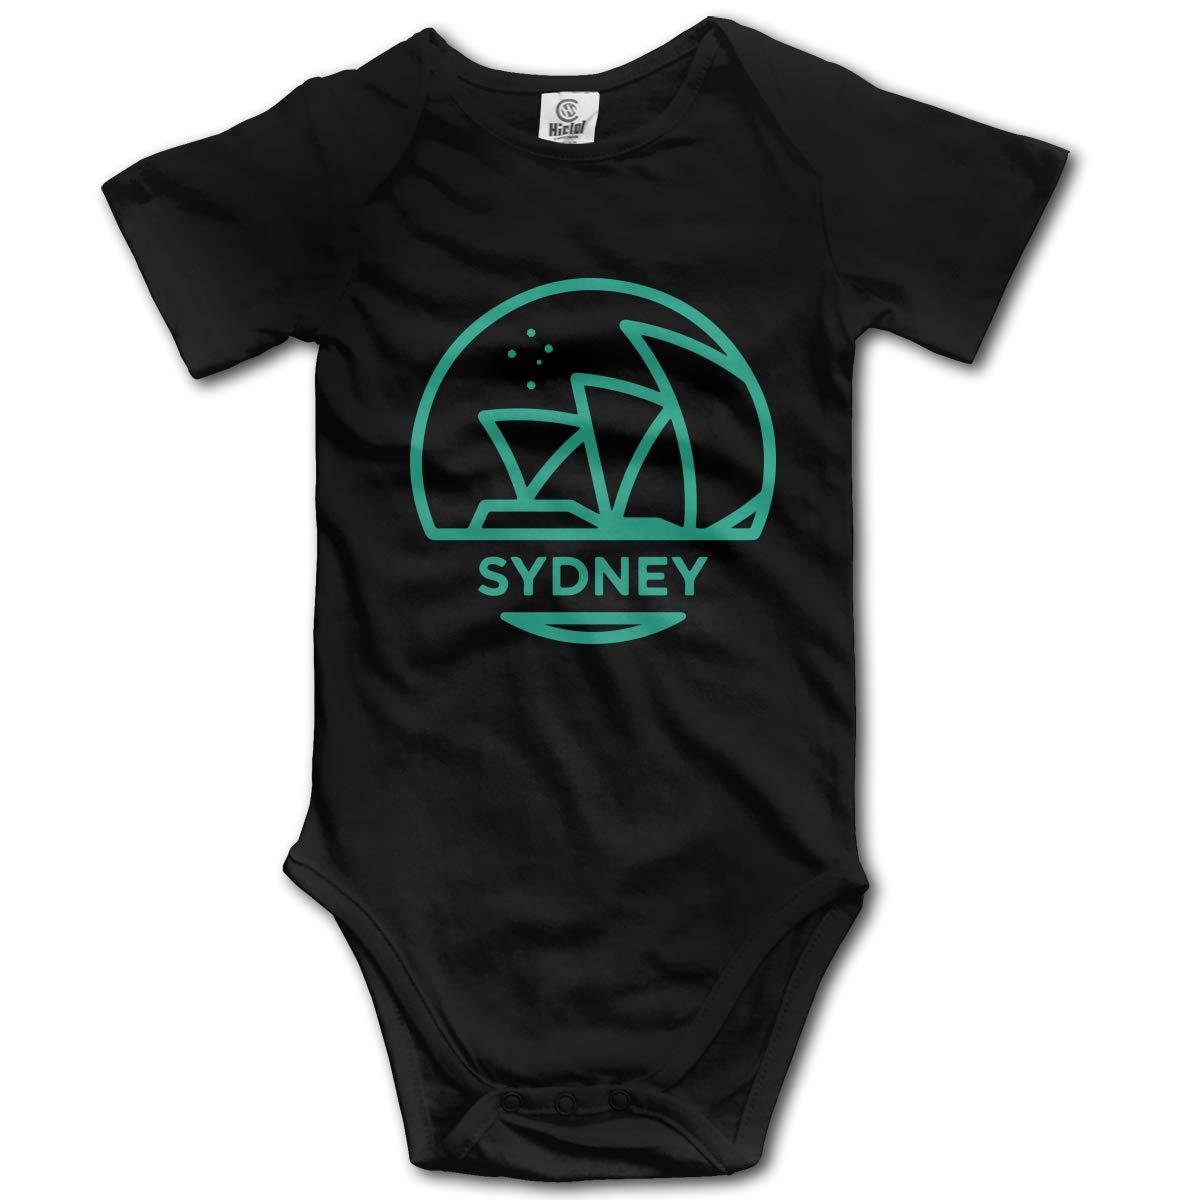 J122 Sydney Suit 6-24 Months Newborn Short Sleeve Baby Clothes Climbing Clothes